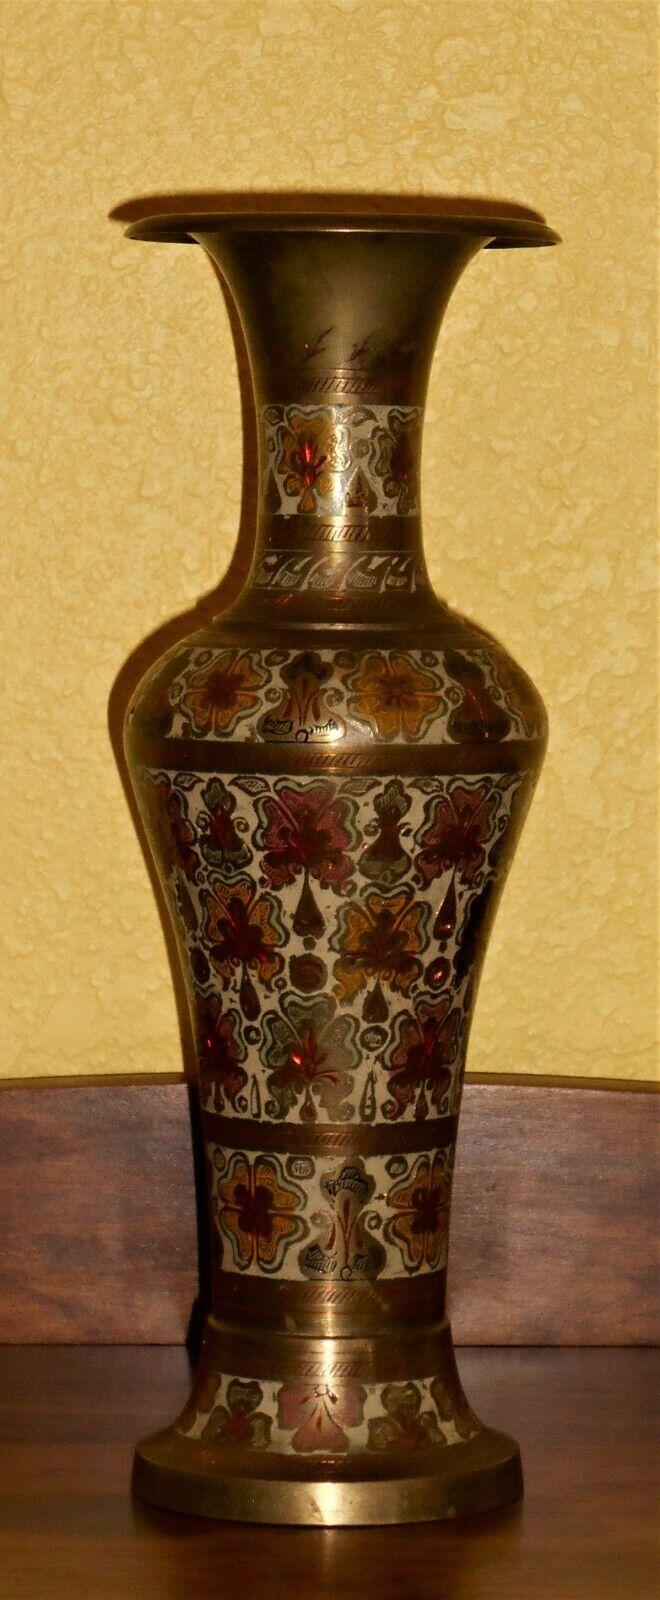 12 Inch Tall Vintage Brass Vase Handpainted Enamelwork Floral Pattern  - $16.00